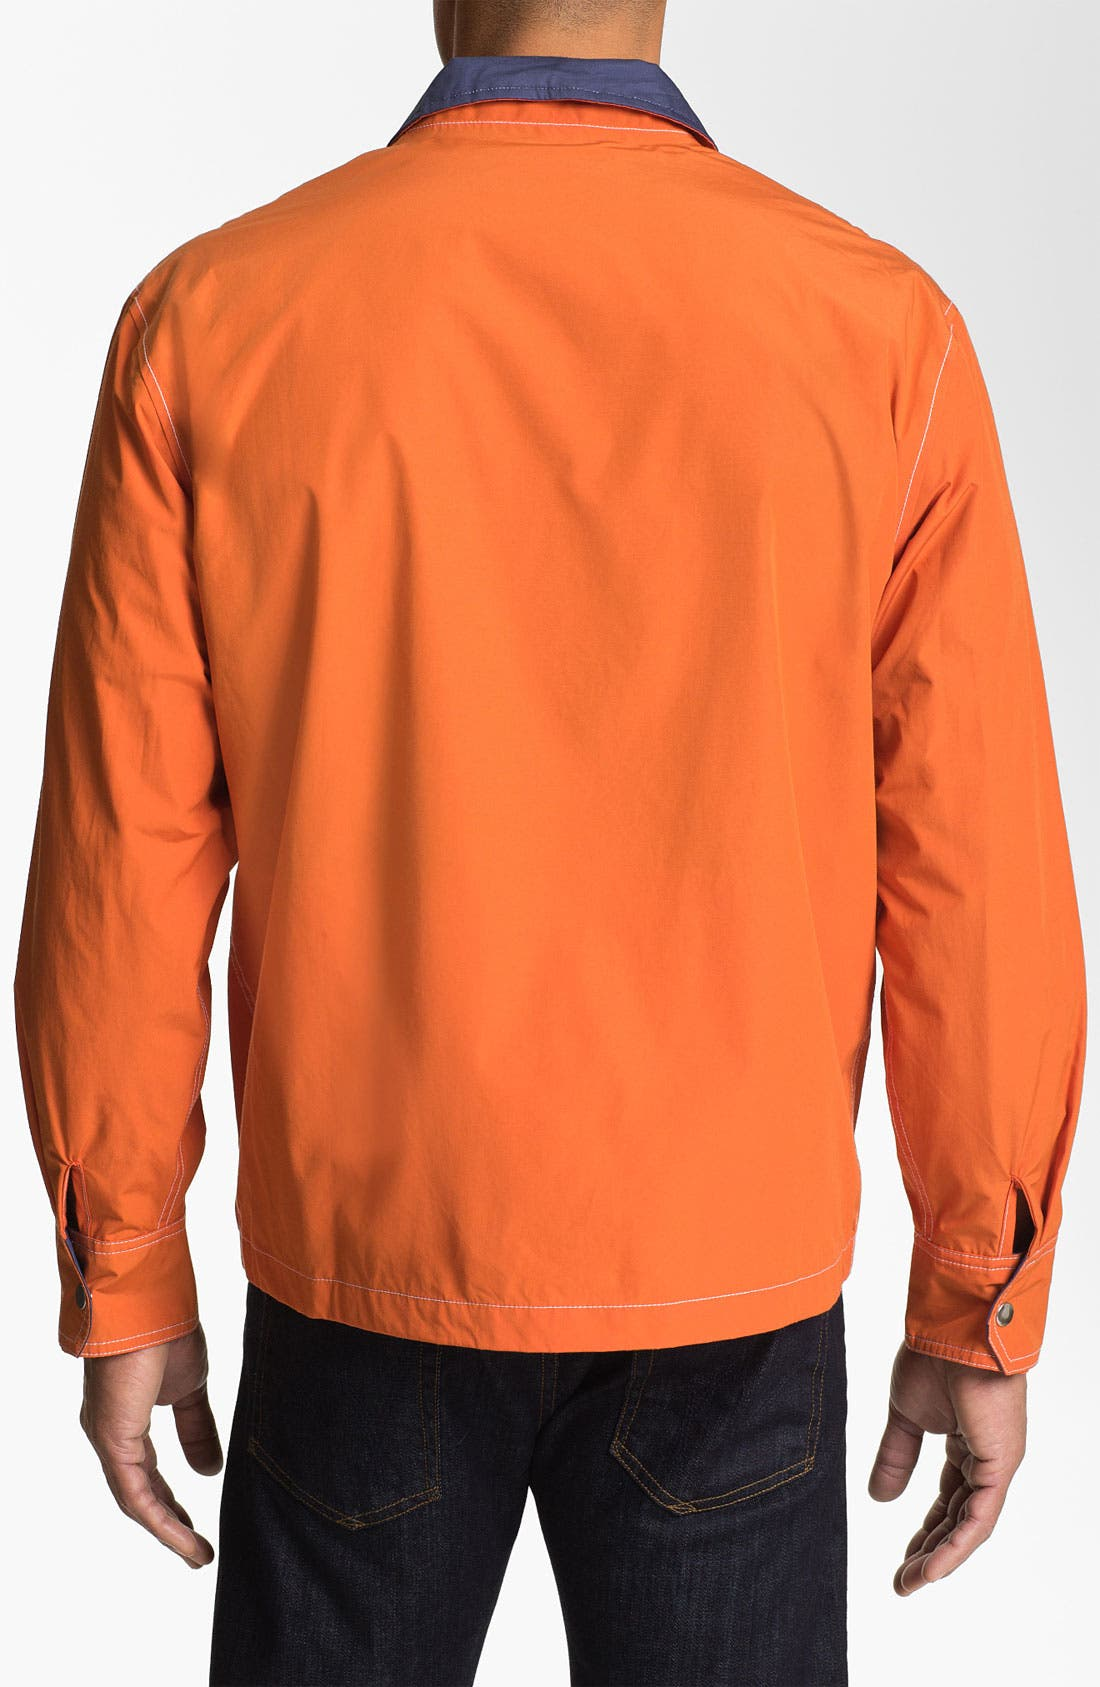 Alternate Image 2  - Cutter & Buck 'North Beach Spring' Jacket (Big & Tall)